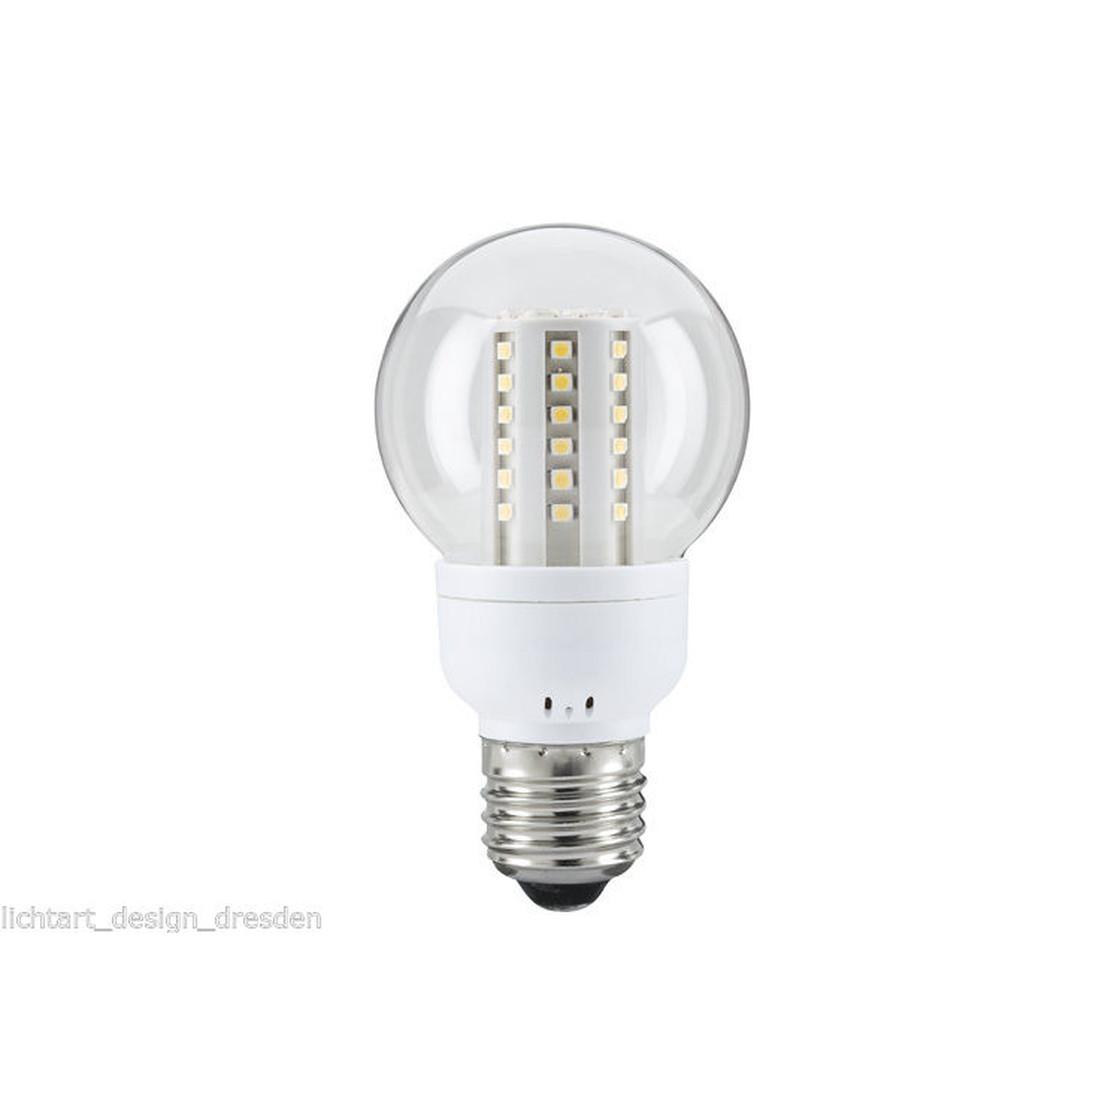 paulmann led leuchtmittel agl 3w e27 warmweiss 230v lampen 9 49. Black Bedroom Furniture Sets. Home Design Ideas